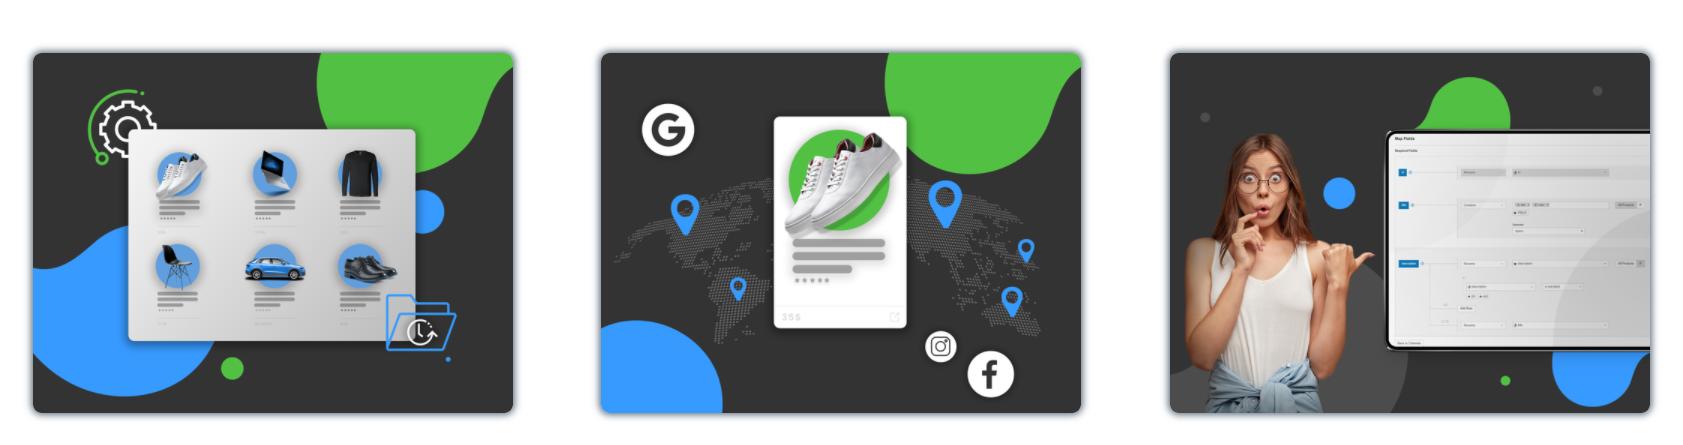 datafeedwatch app